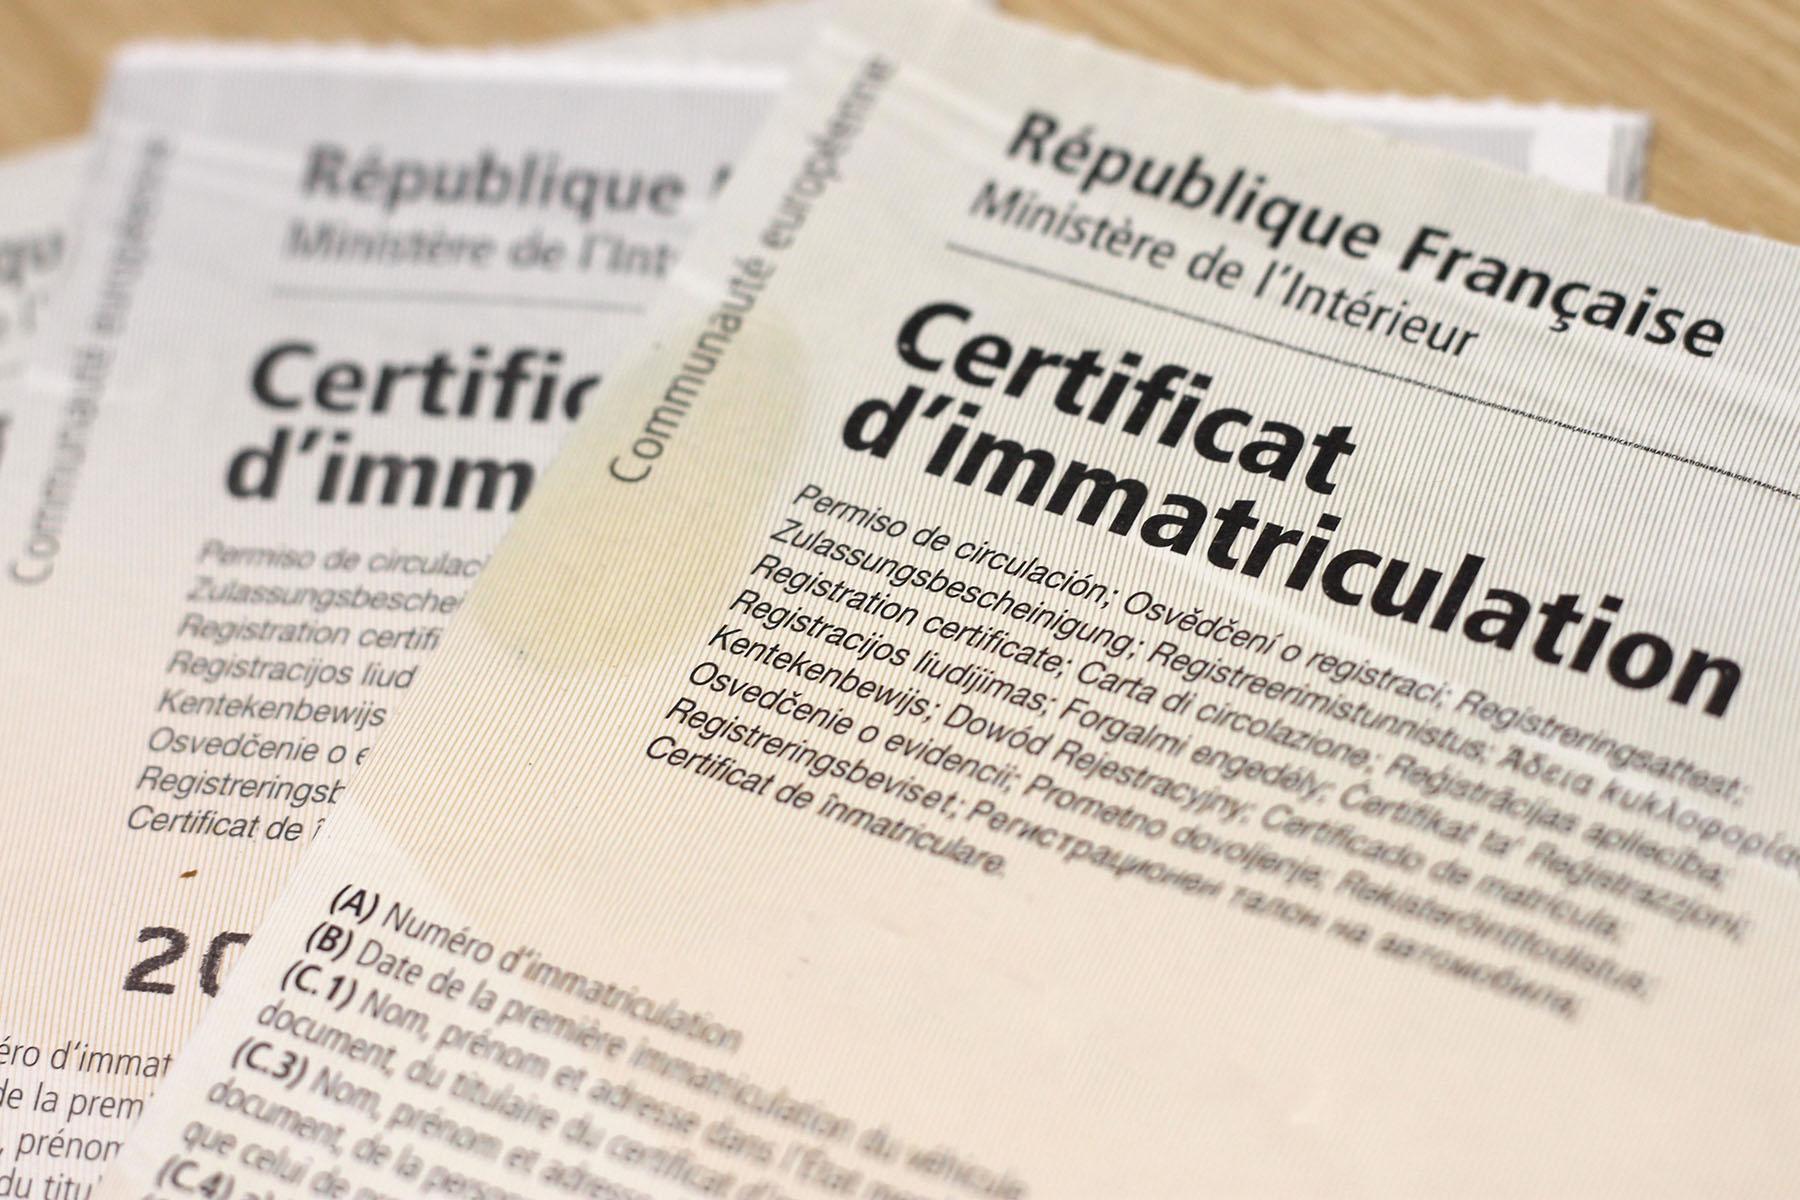 Image de carte grise - Certificat d'immatriculation